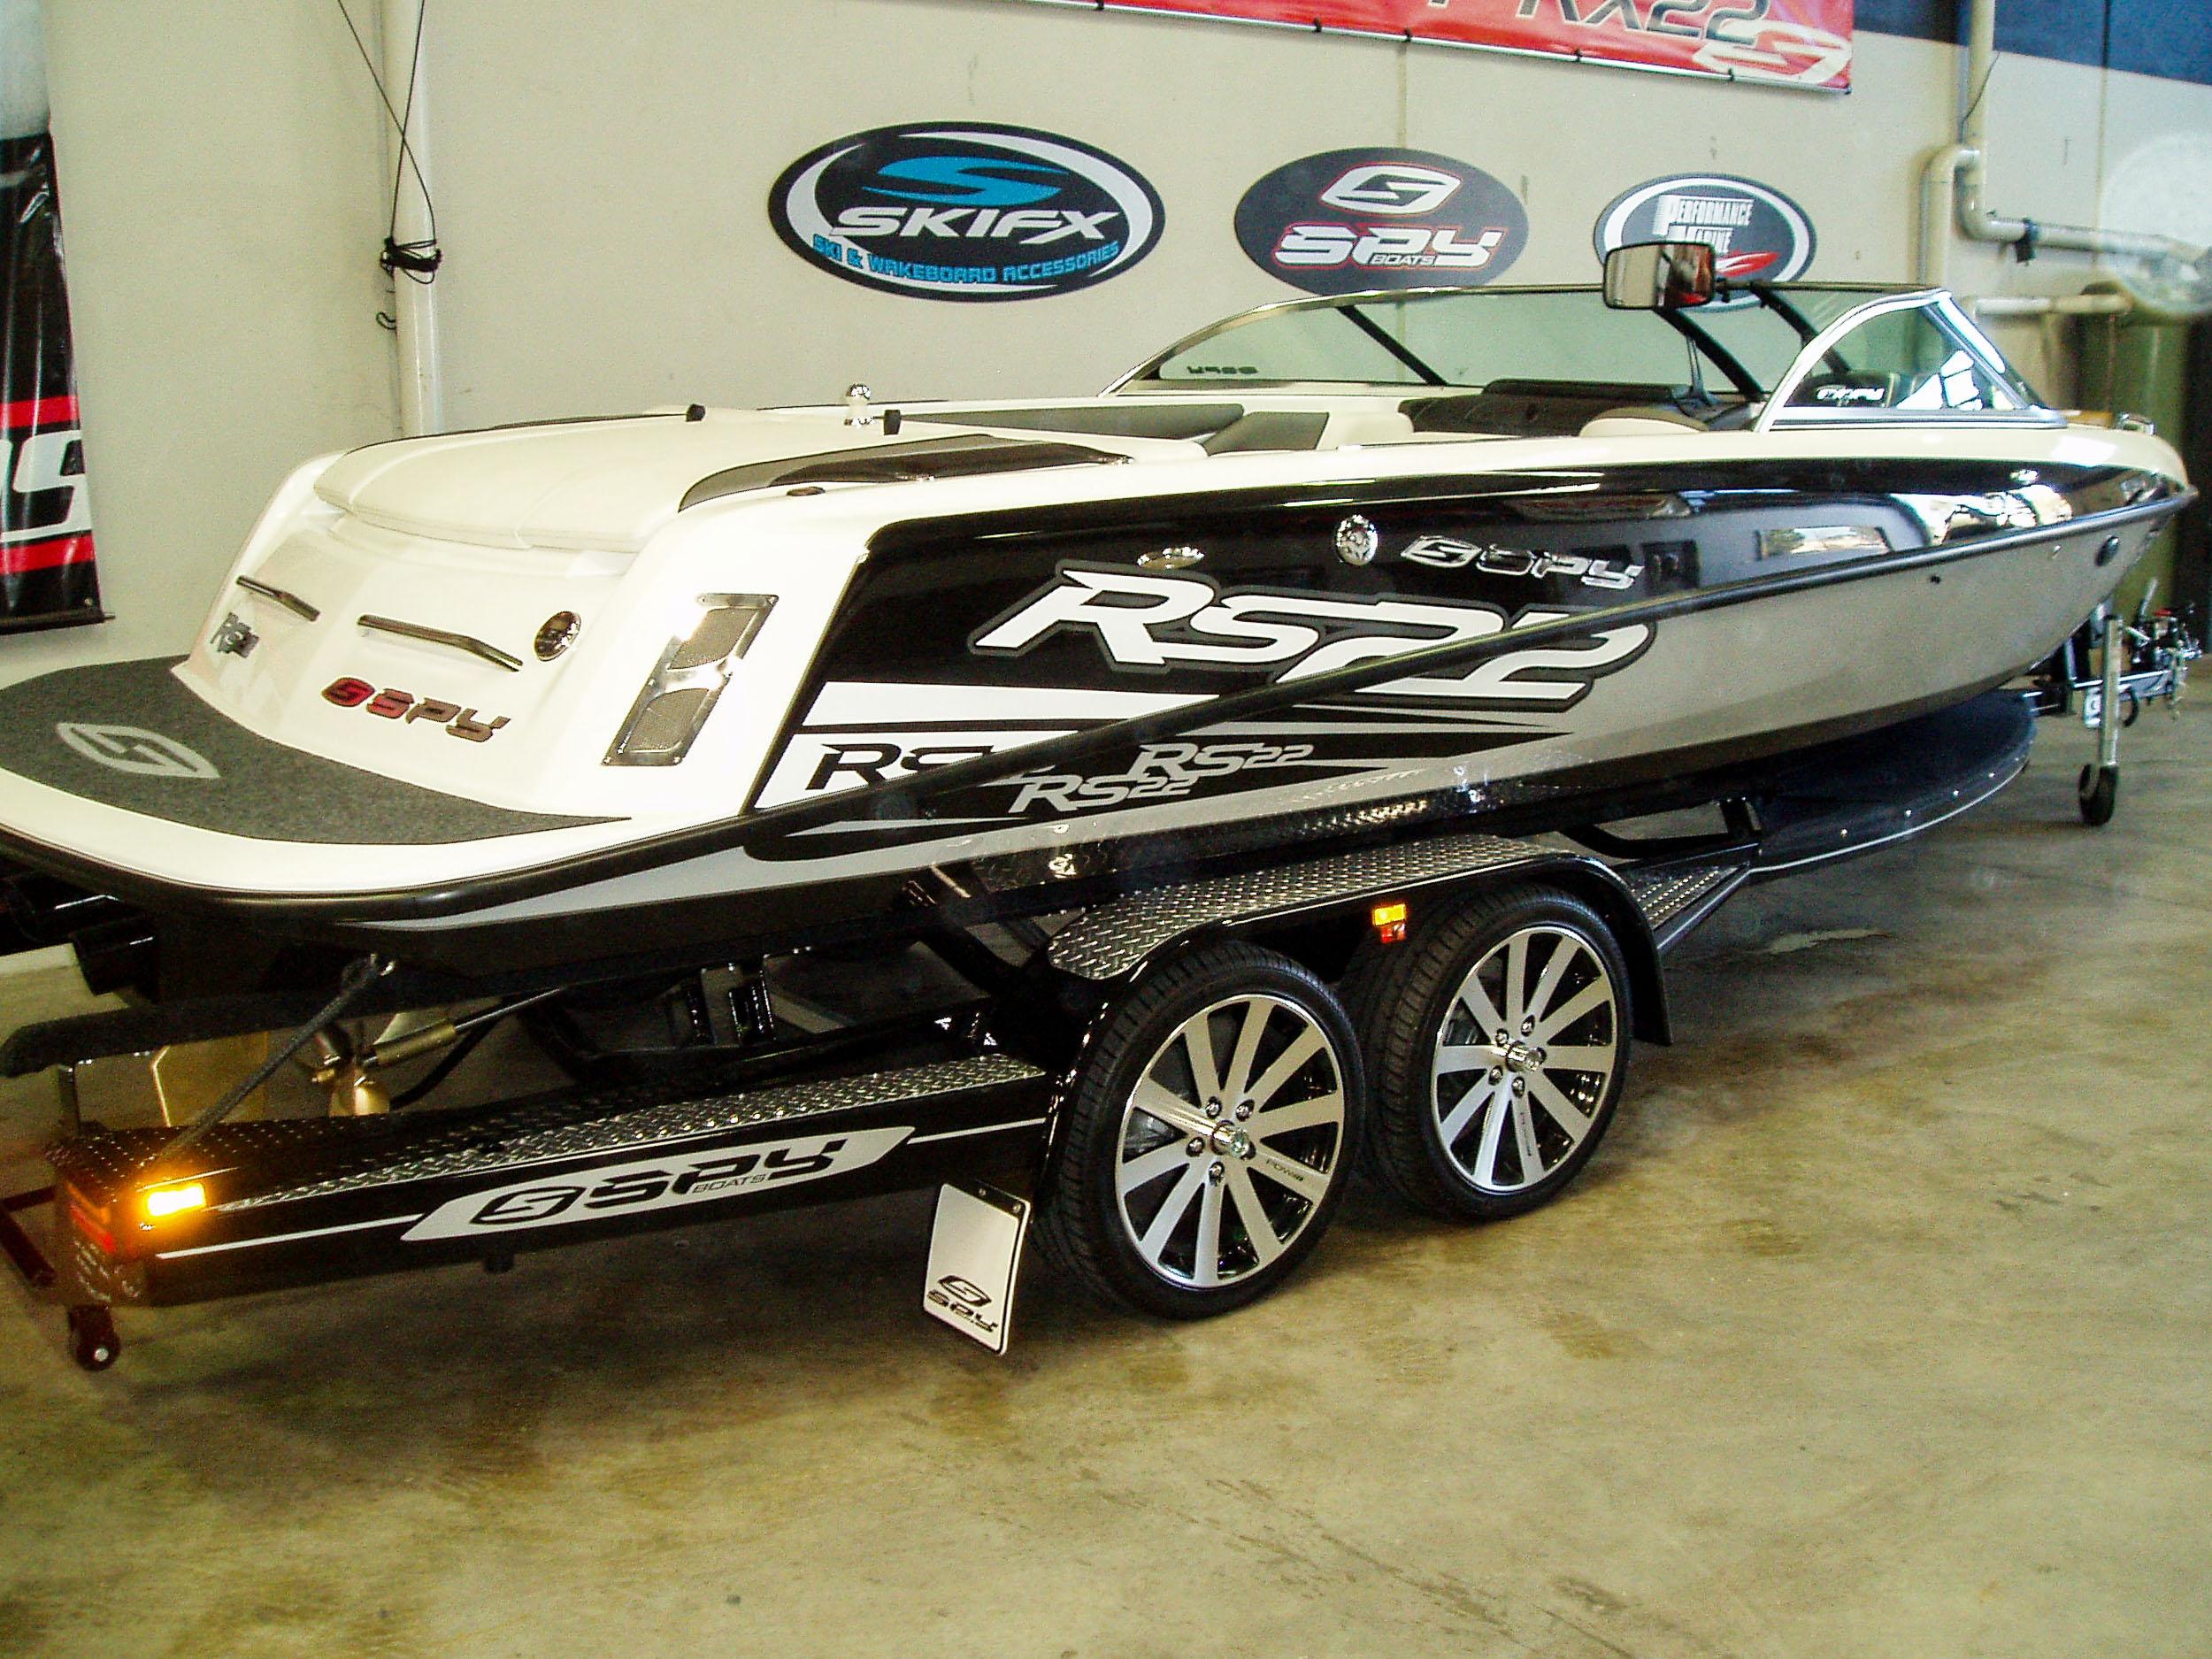 Spy_Boats_RS22-24.jpg